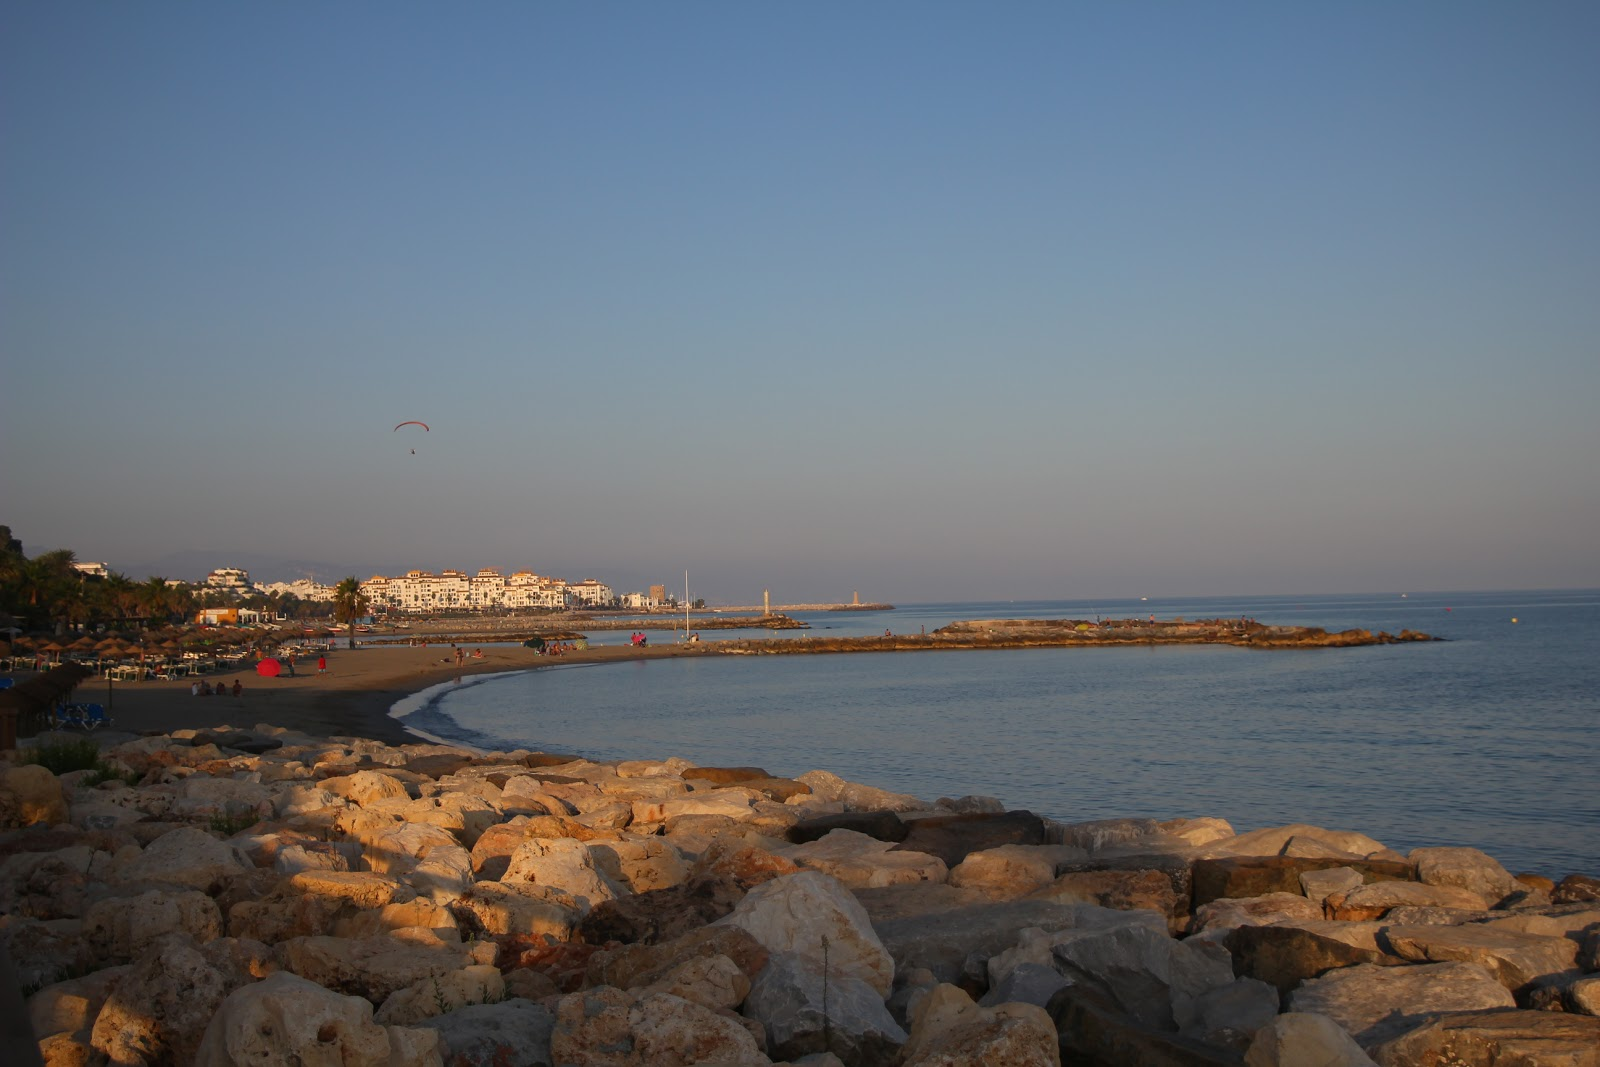 W Rozjazdach Marbella I Puerto Banus Hiszpania